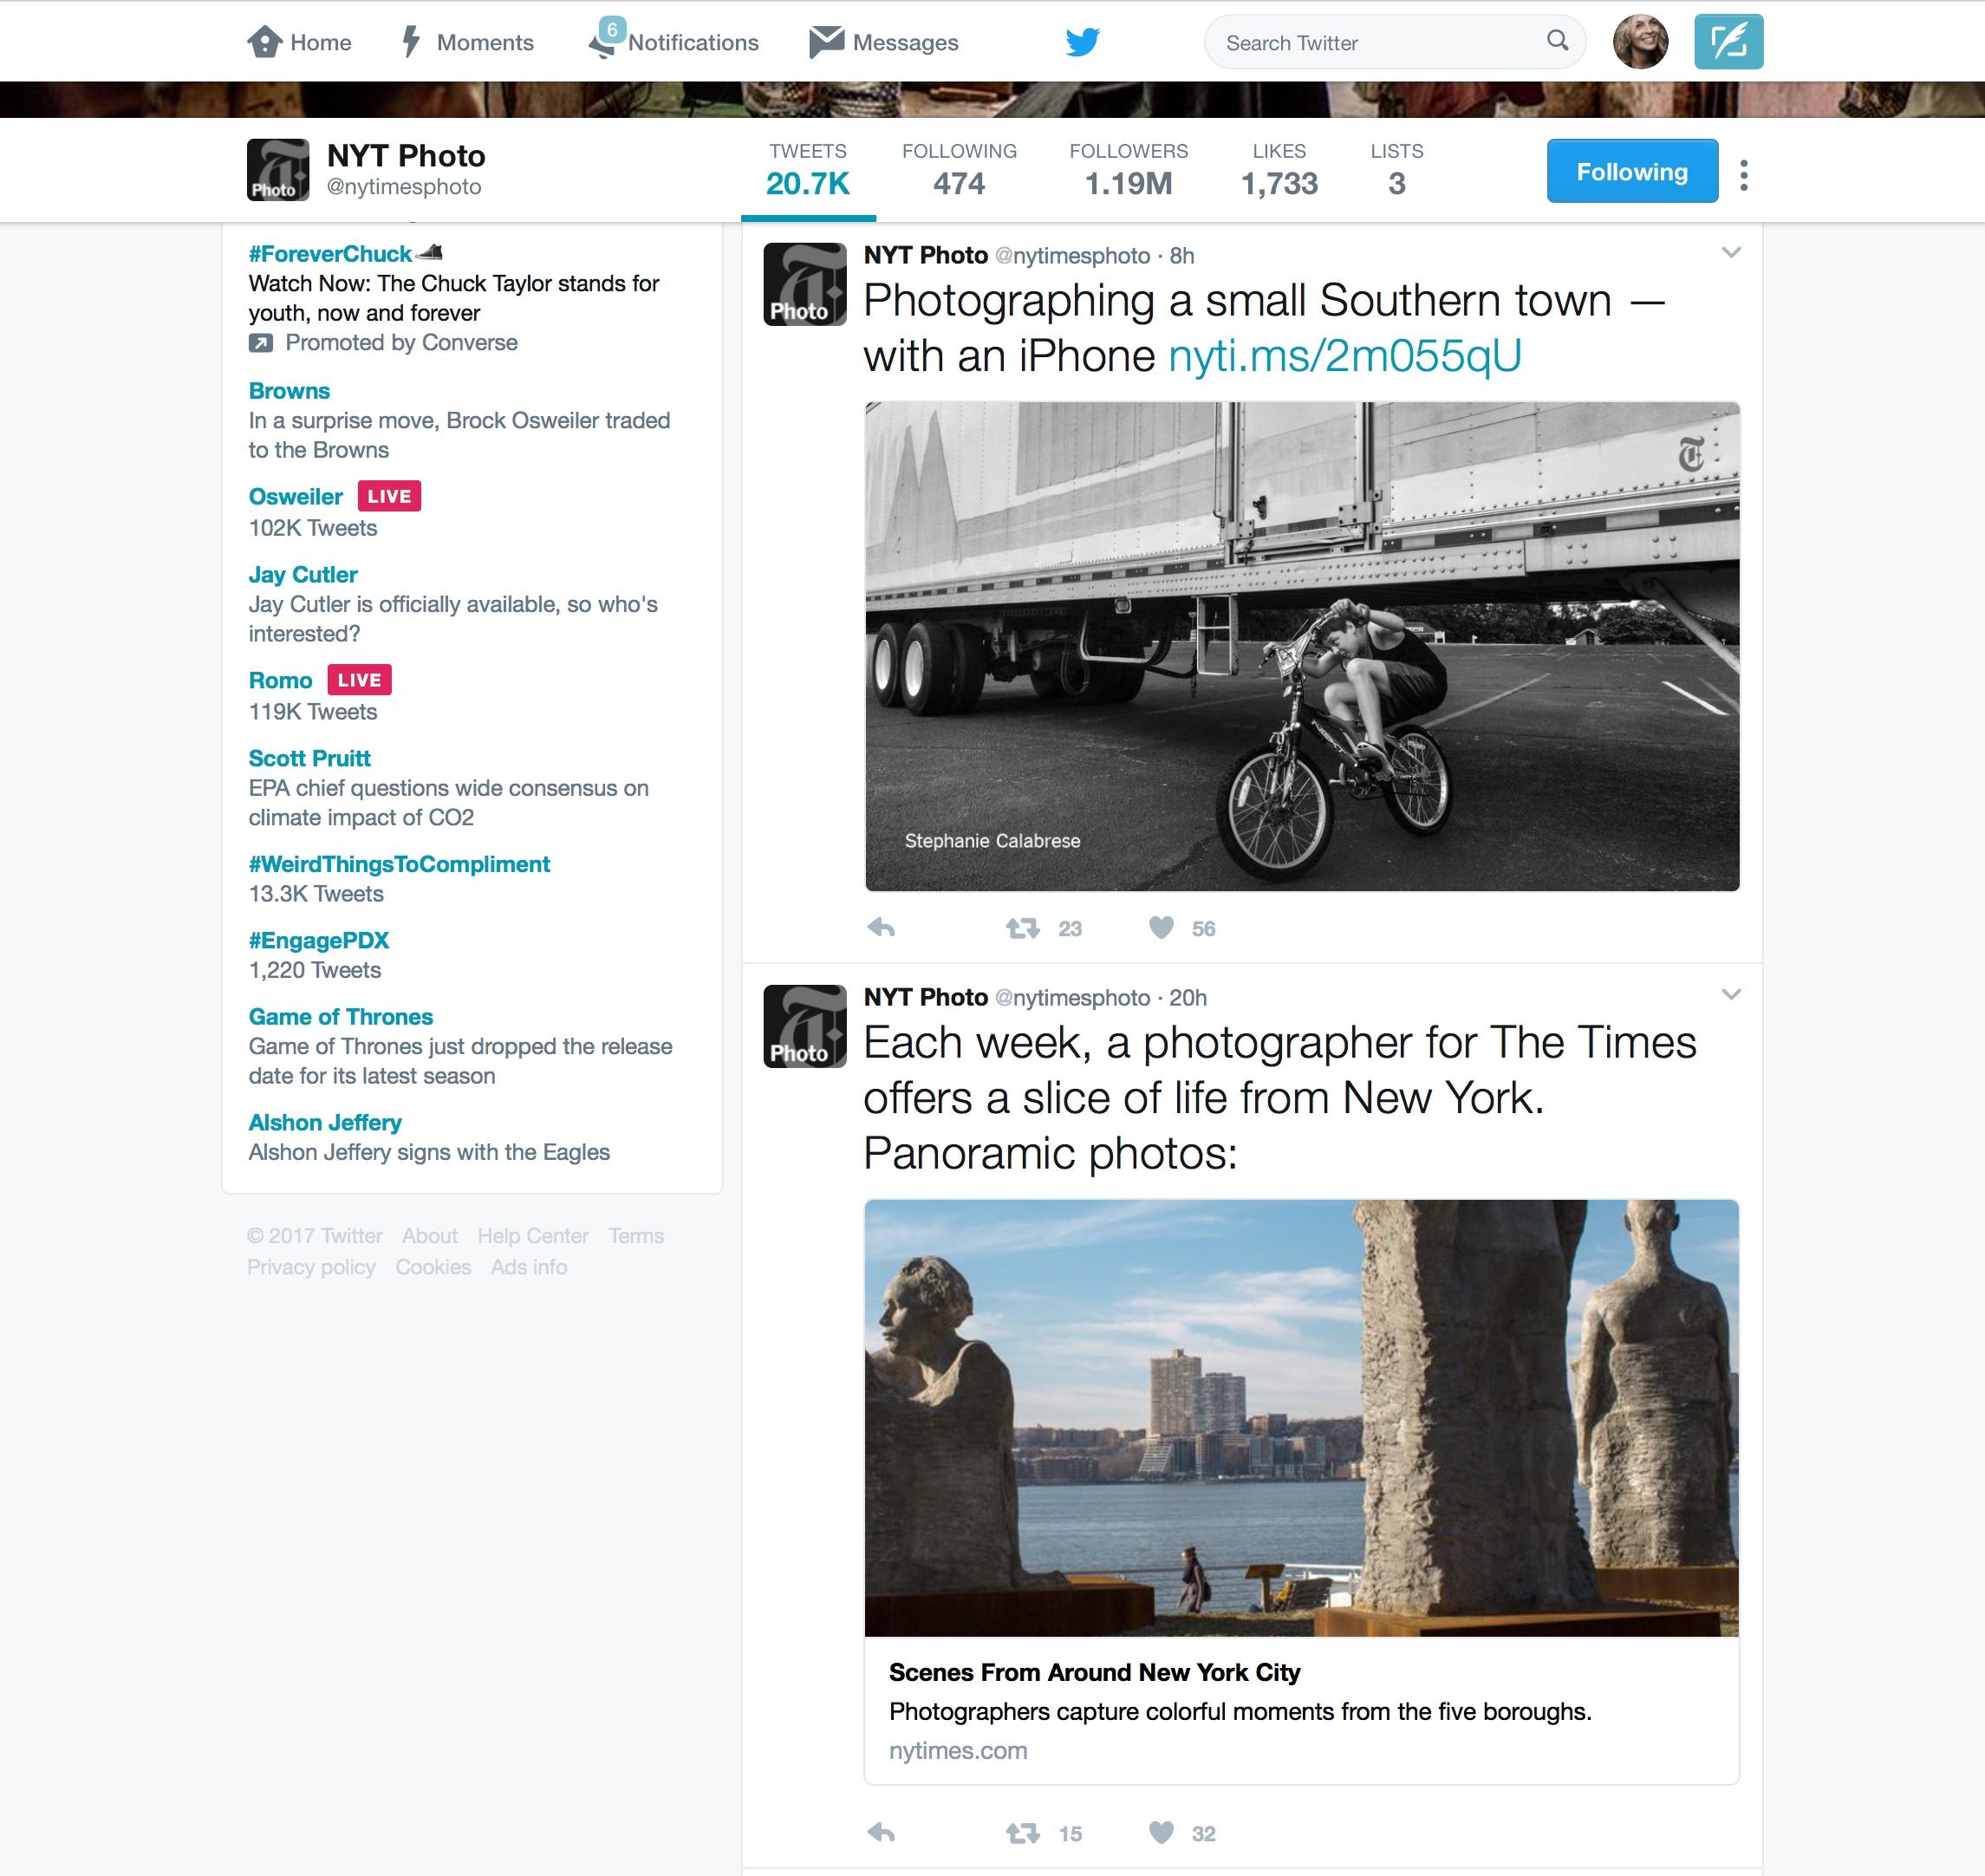 NYTLens_HometownTwitter2.jpeg